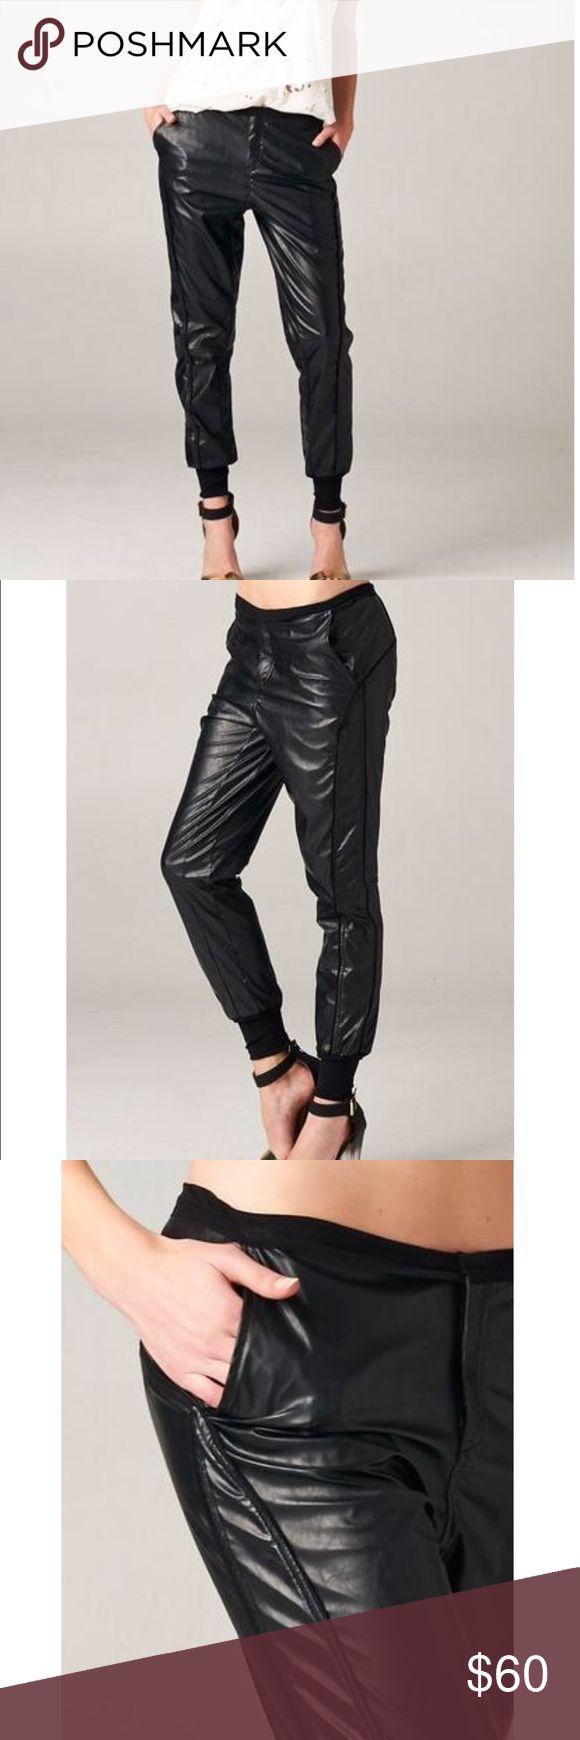 Black Faux Leather Jogger Pants Coming soon Pants Track Pants & Joggers